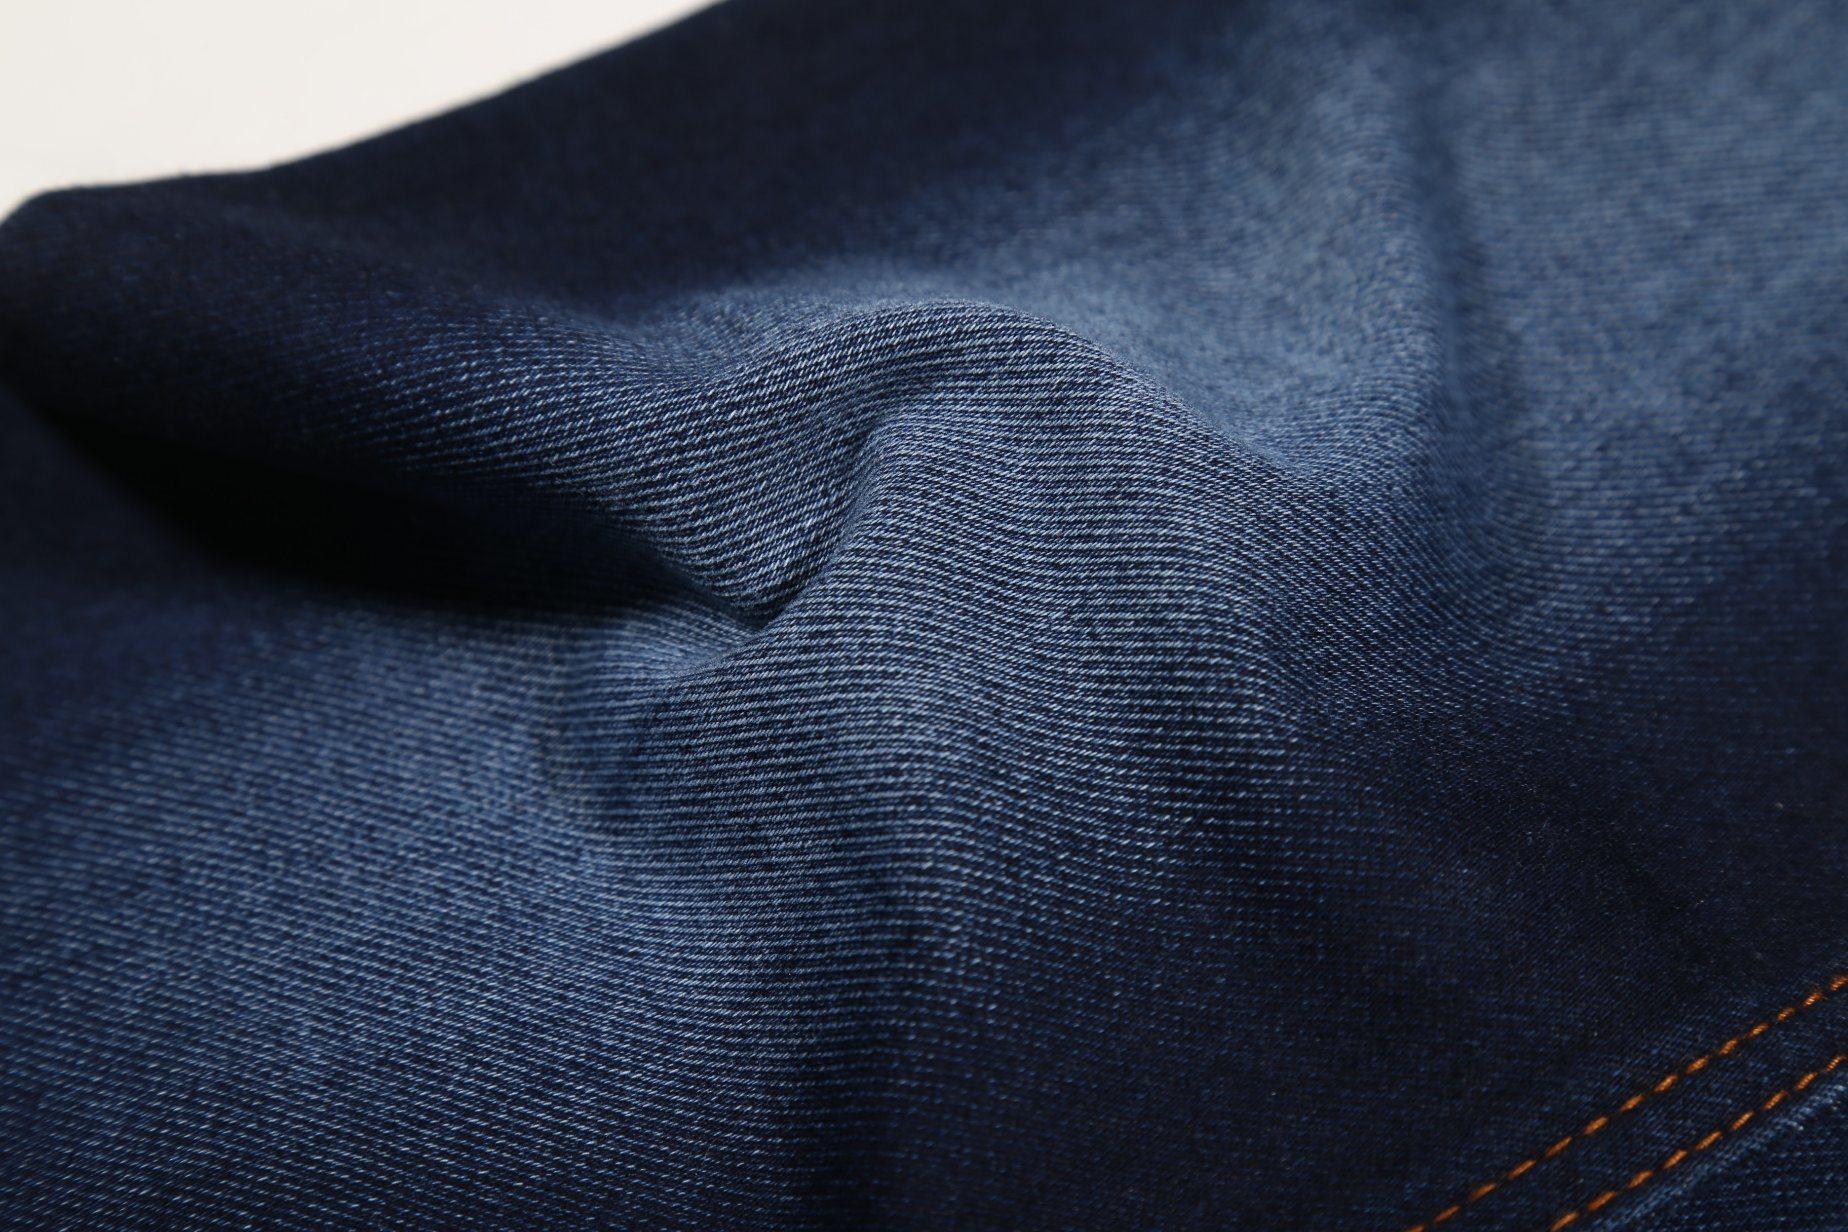 Indigo Color, Super Soft Wearing Terry Denim fabric